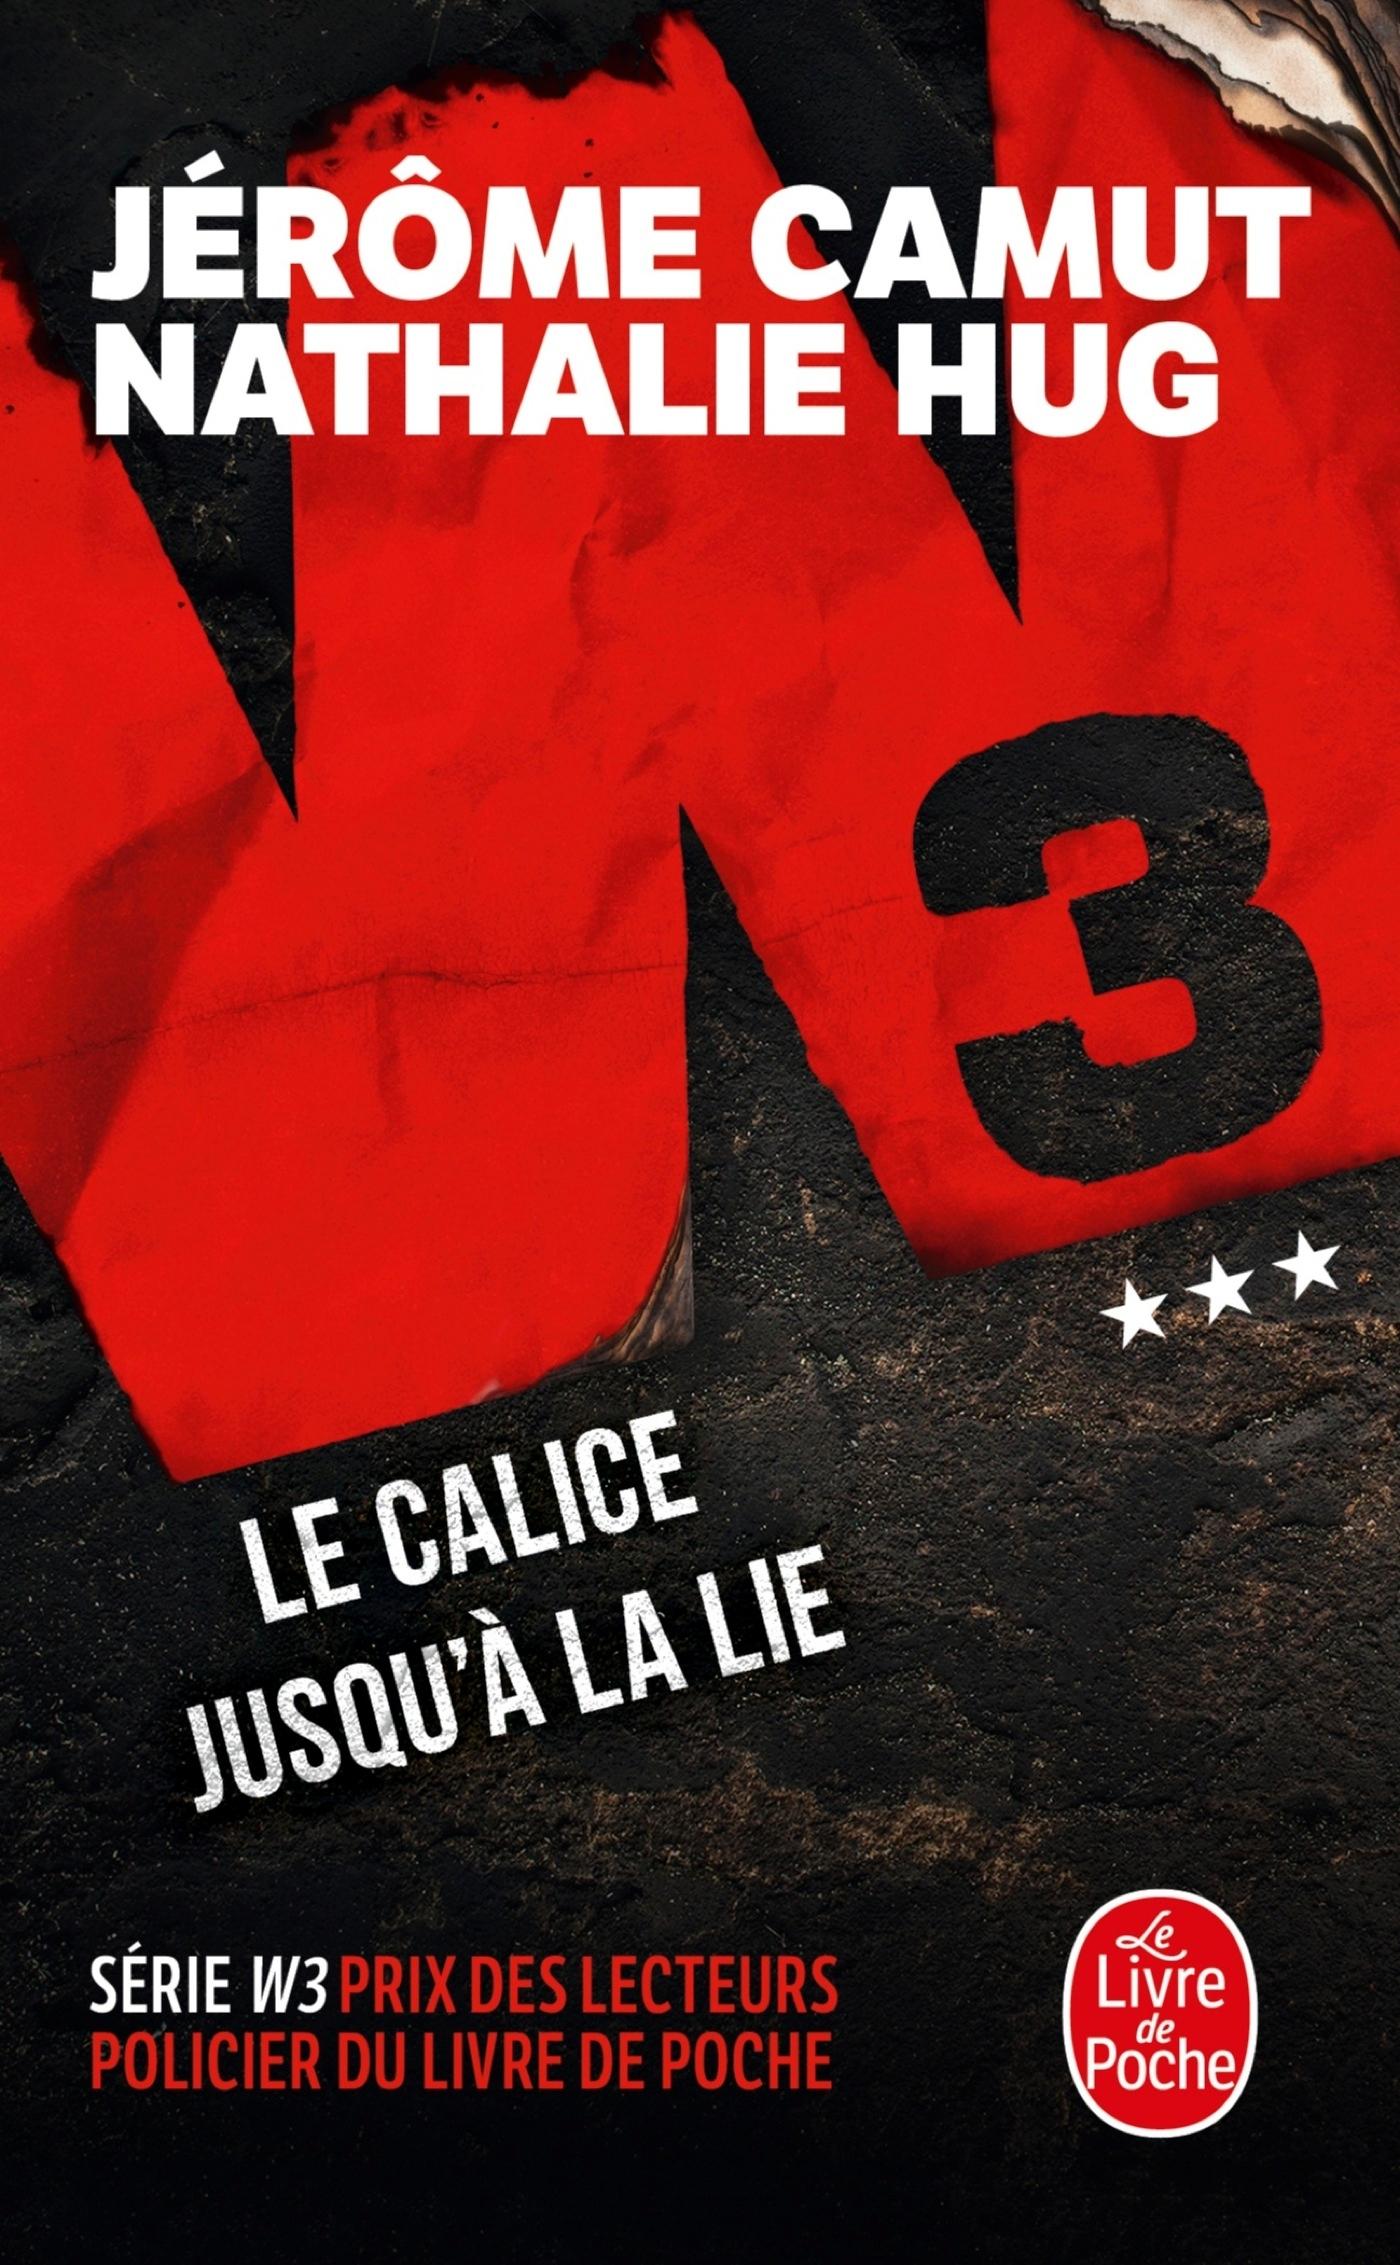 LE CALICE JUSQU'A LA LIE (W3, TOME 3)